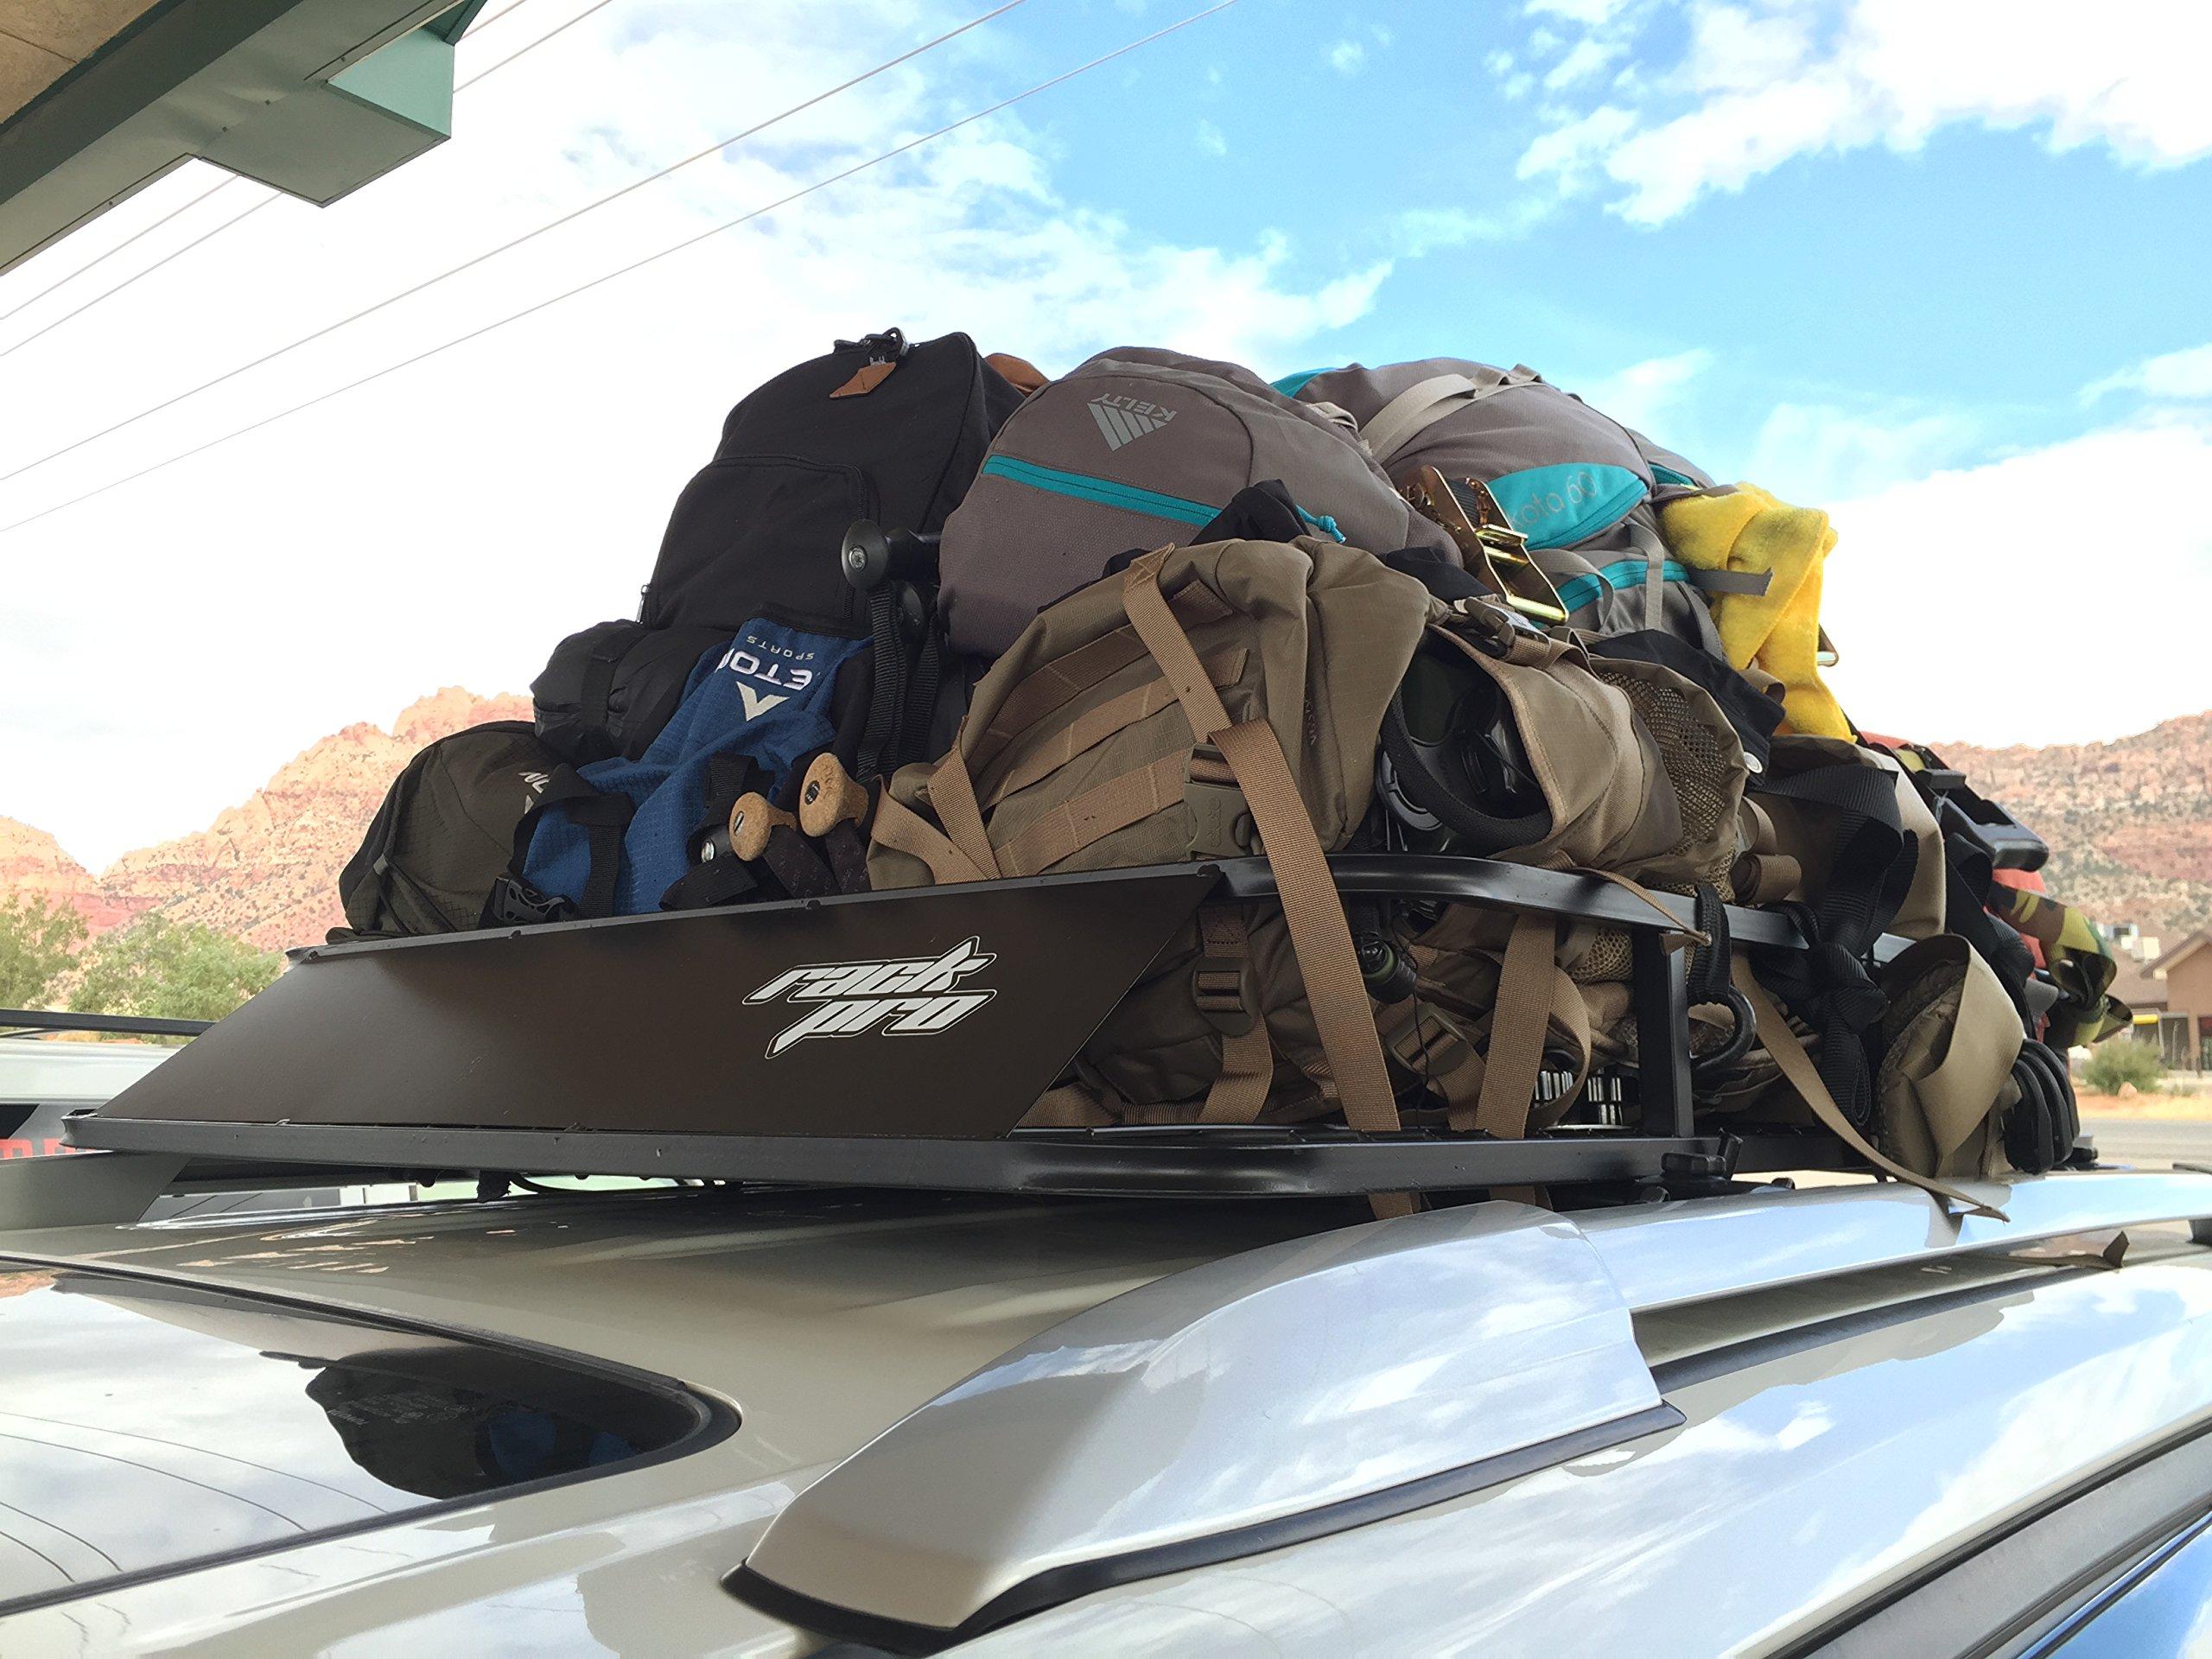 Universal Roof Rack Cargo Car Top Luggage Carrier Basket Traveling SUV Holder